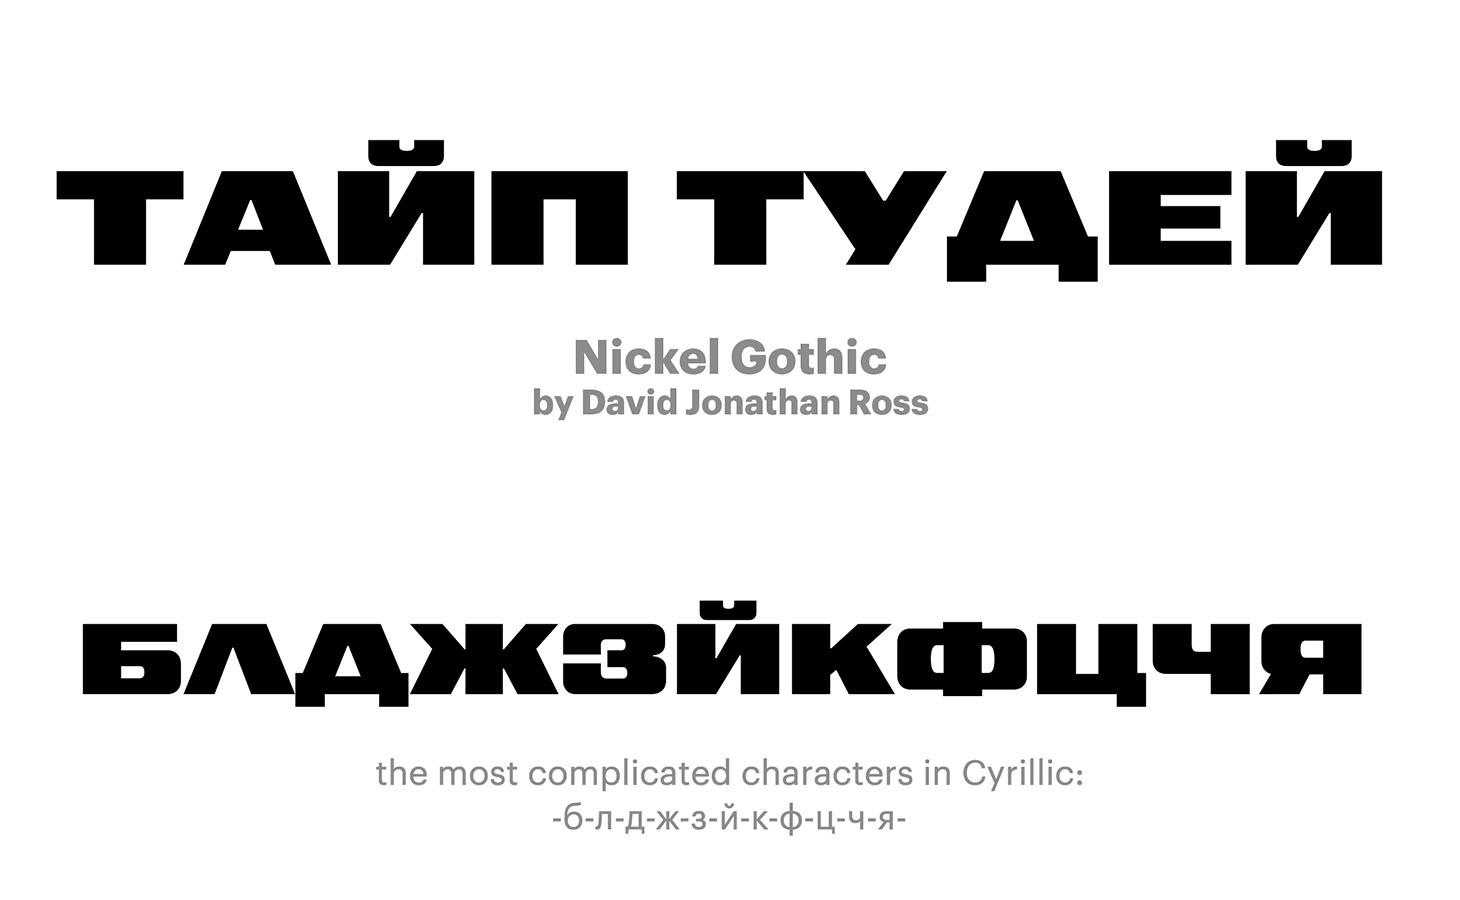 Nickel-Gothic